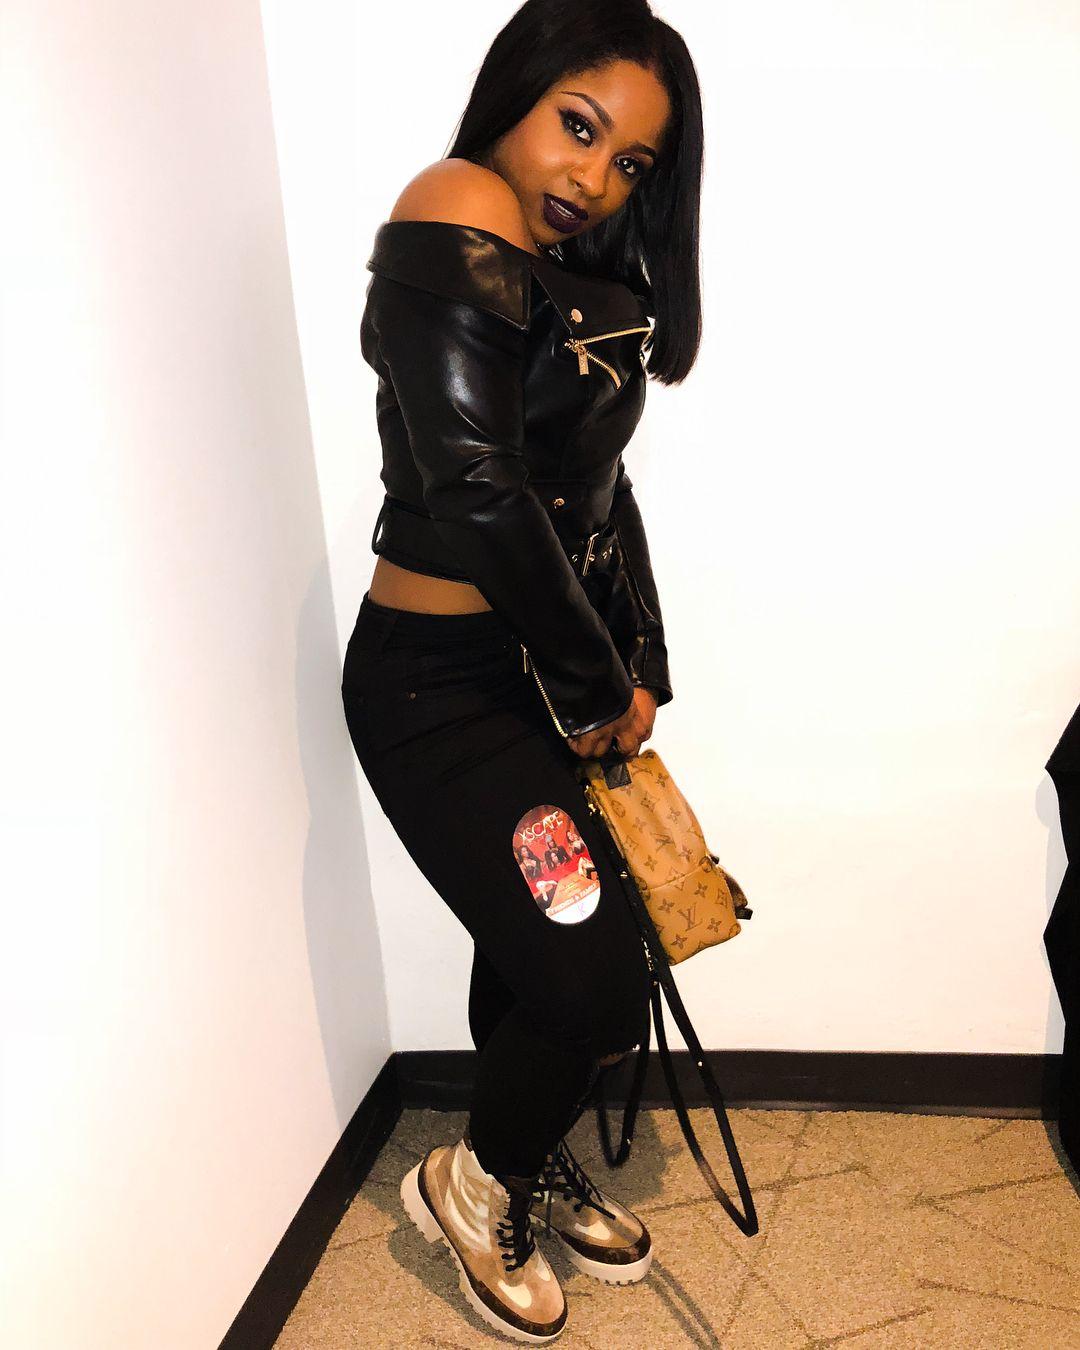 Reginae Carter | Biker outfit, Urban outfits, Fashion wear